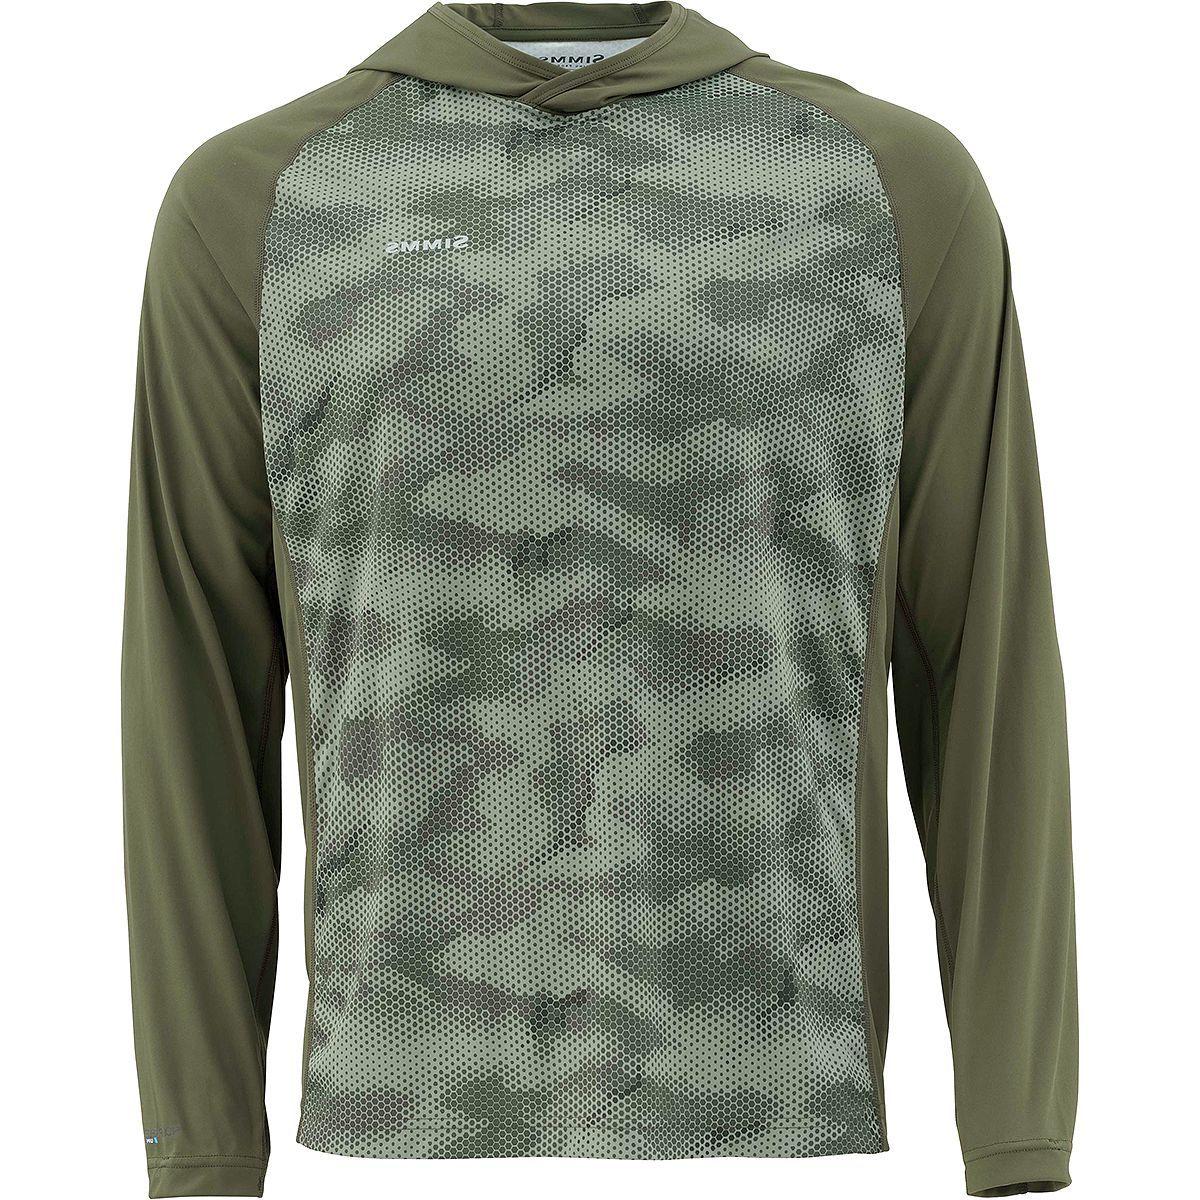 Simms Solarflex Hooded Print Shirt - Men's